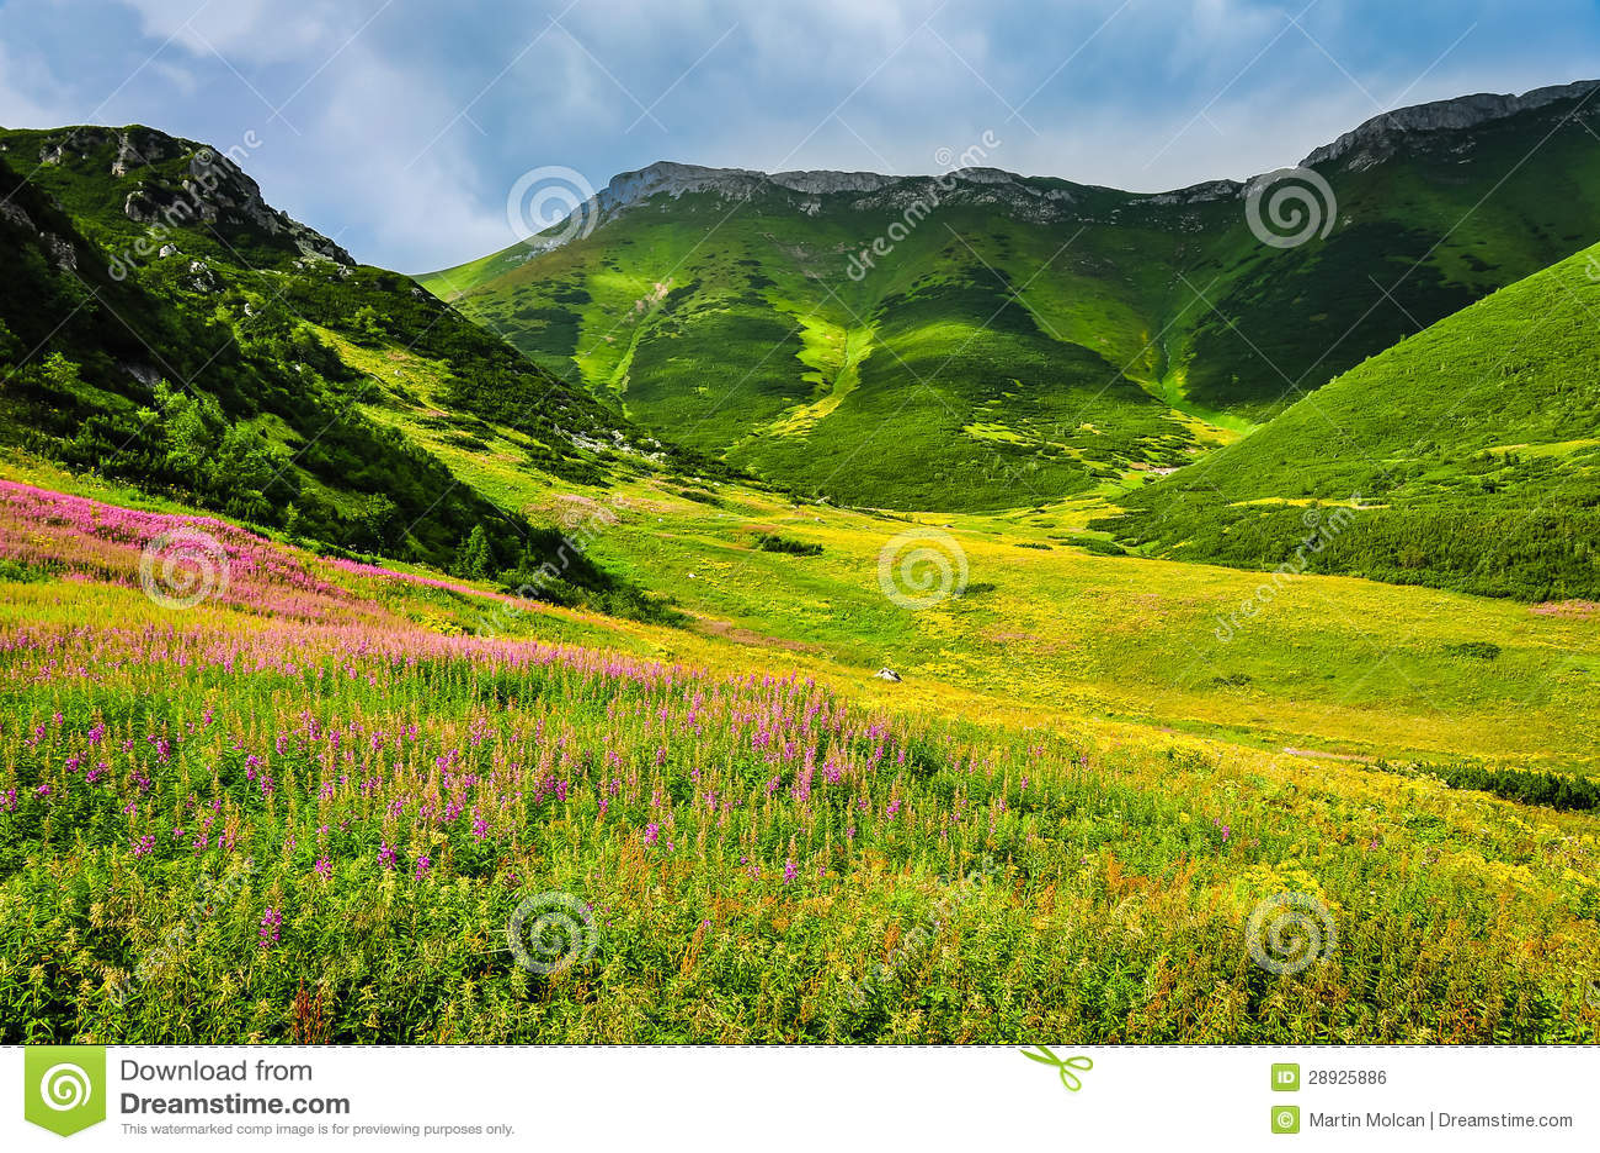 High tatras mountain green meadow with wild flowers